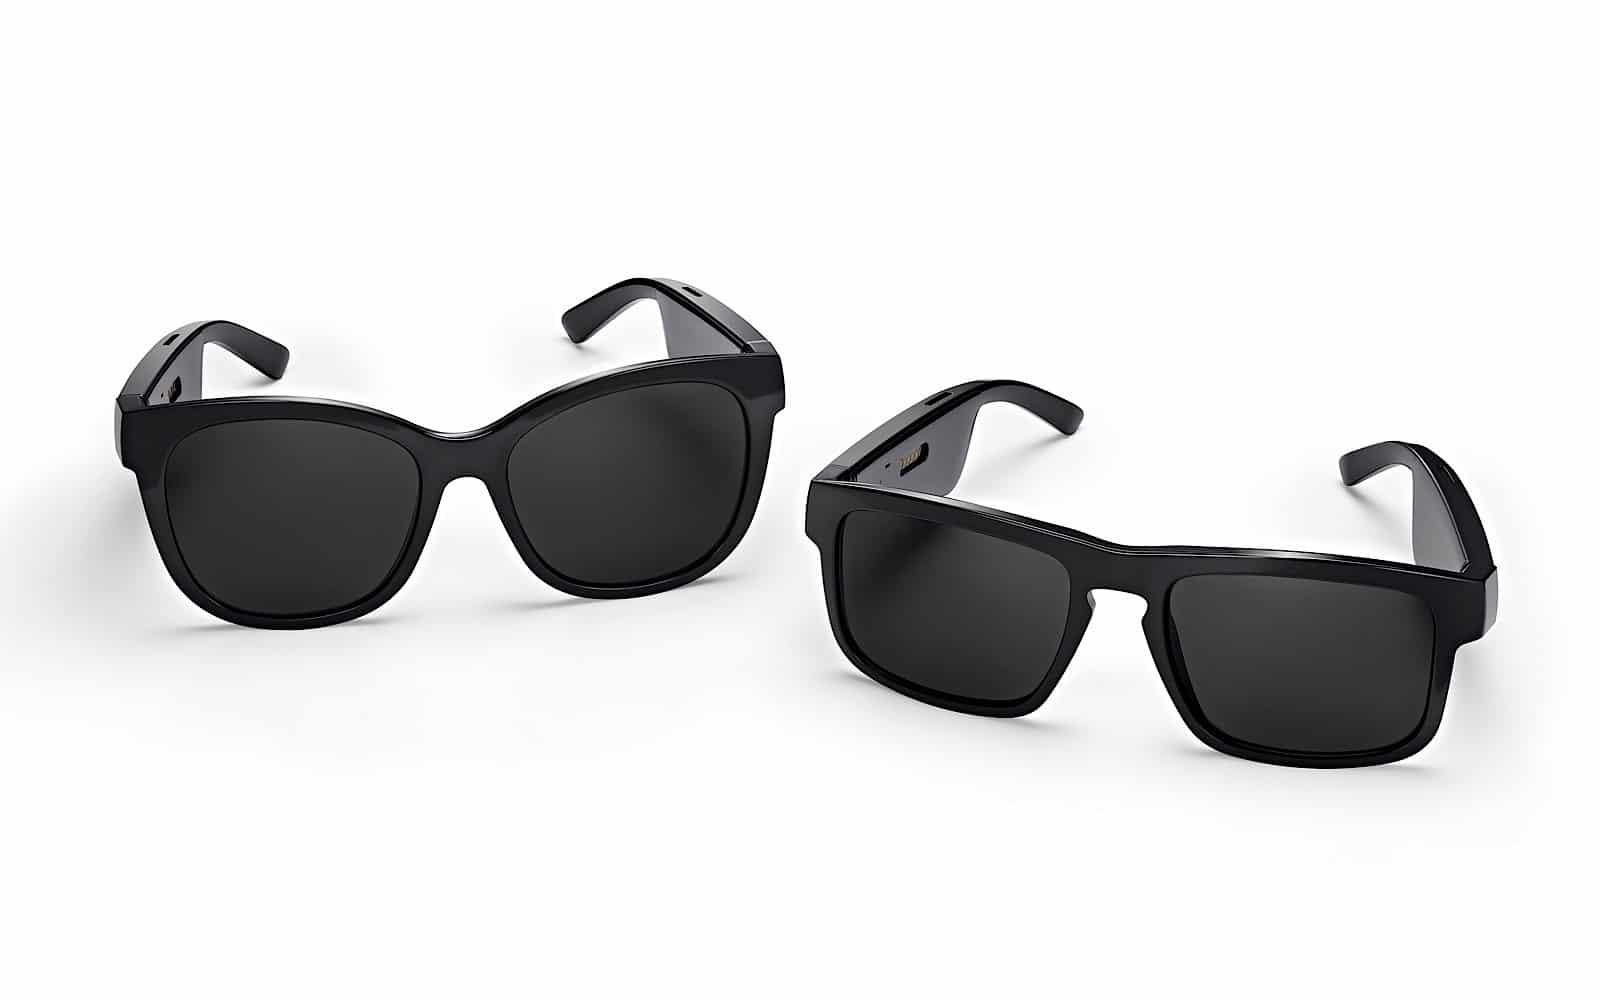 Bose Frames: Bose Tenor and Bose Soprano